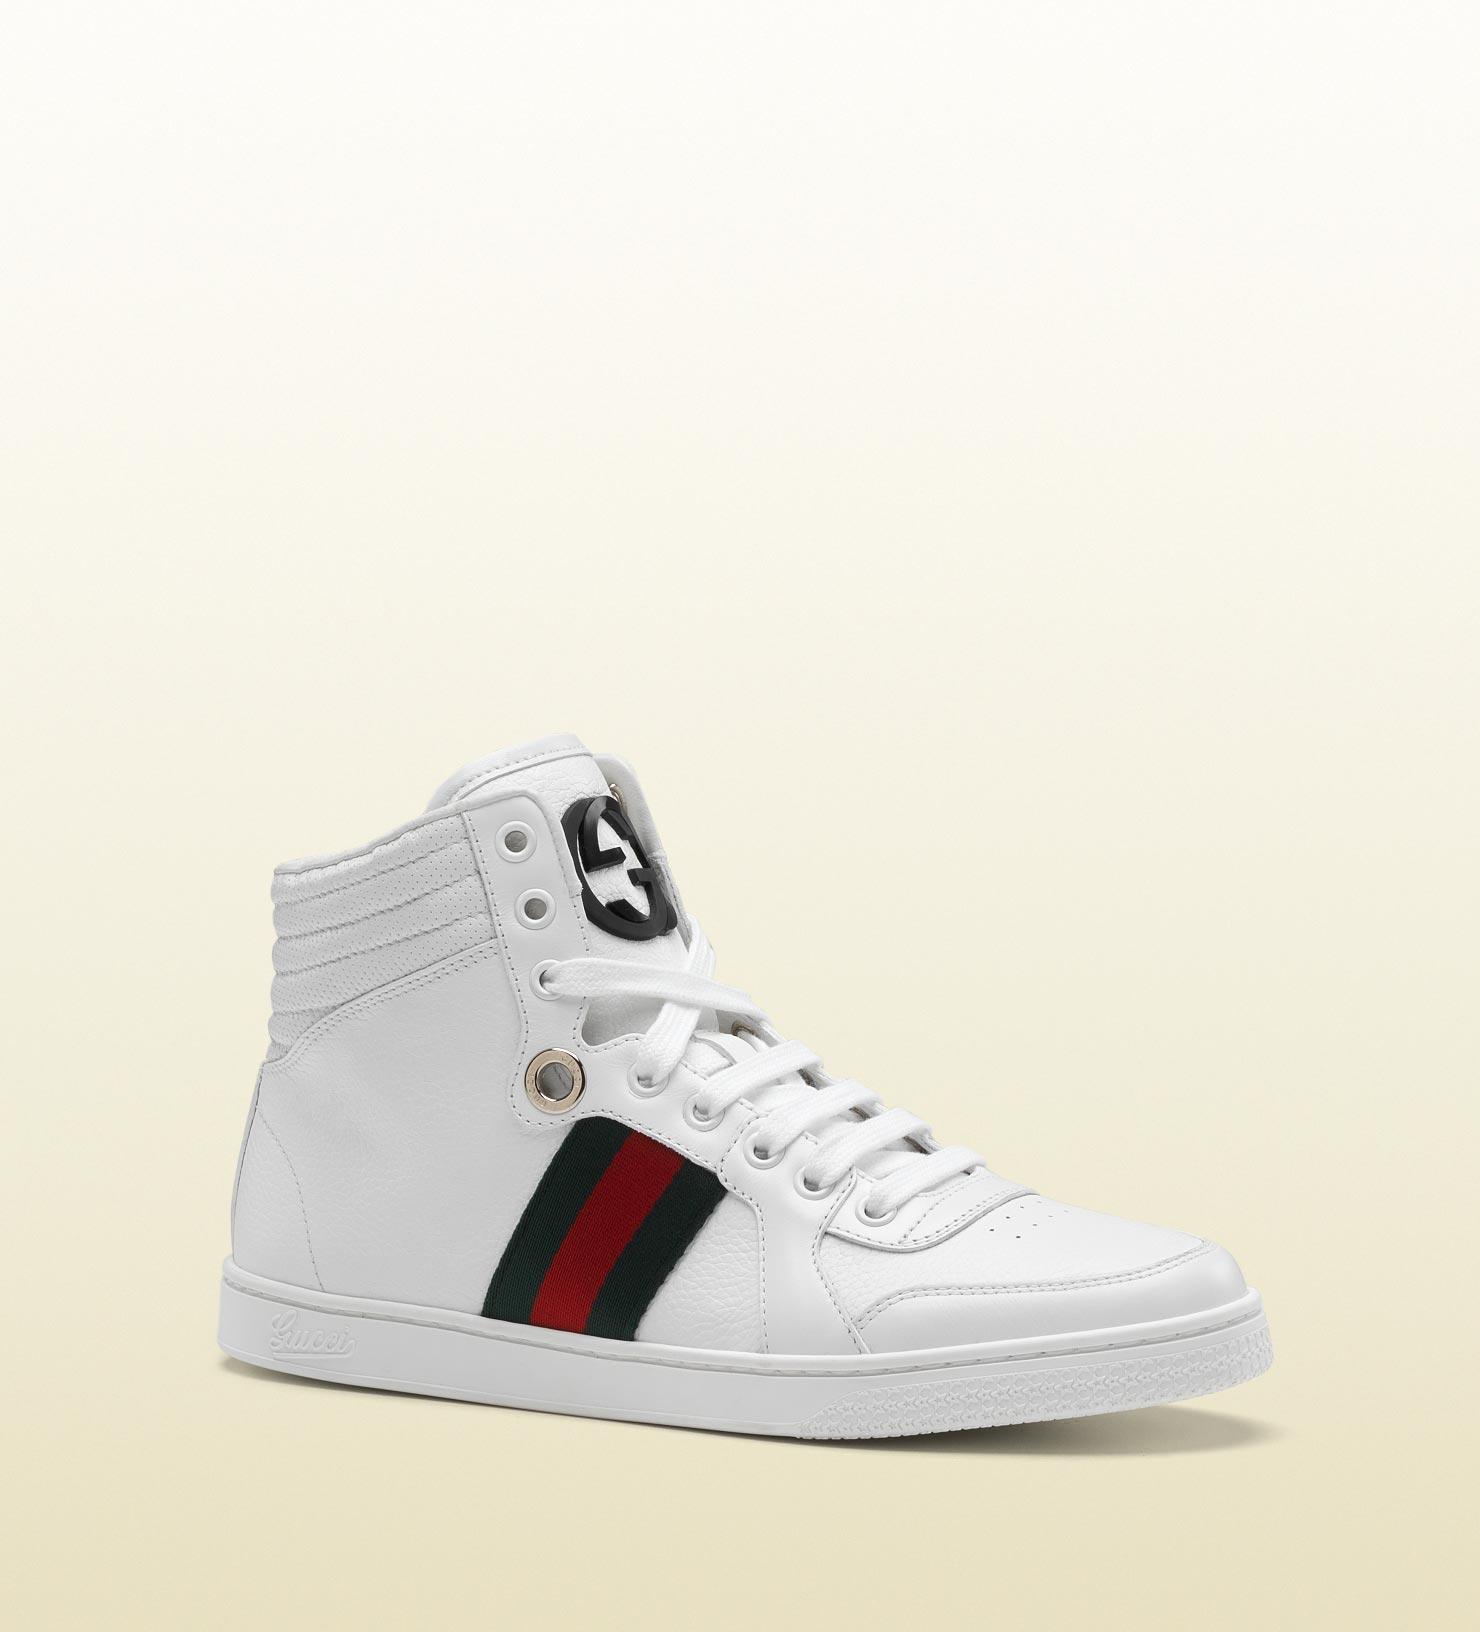 gucci coda hitop sneaker with interlocking g and